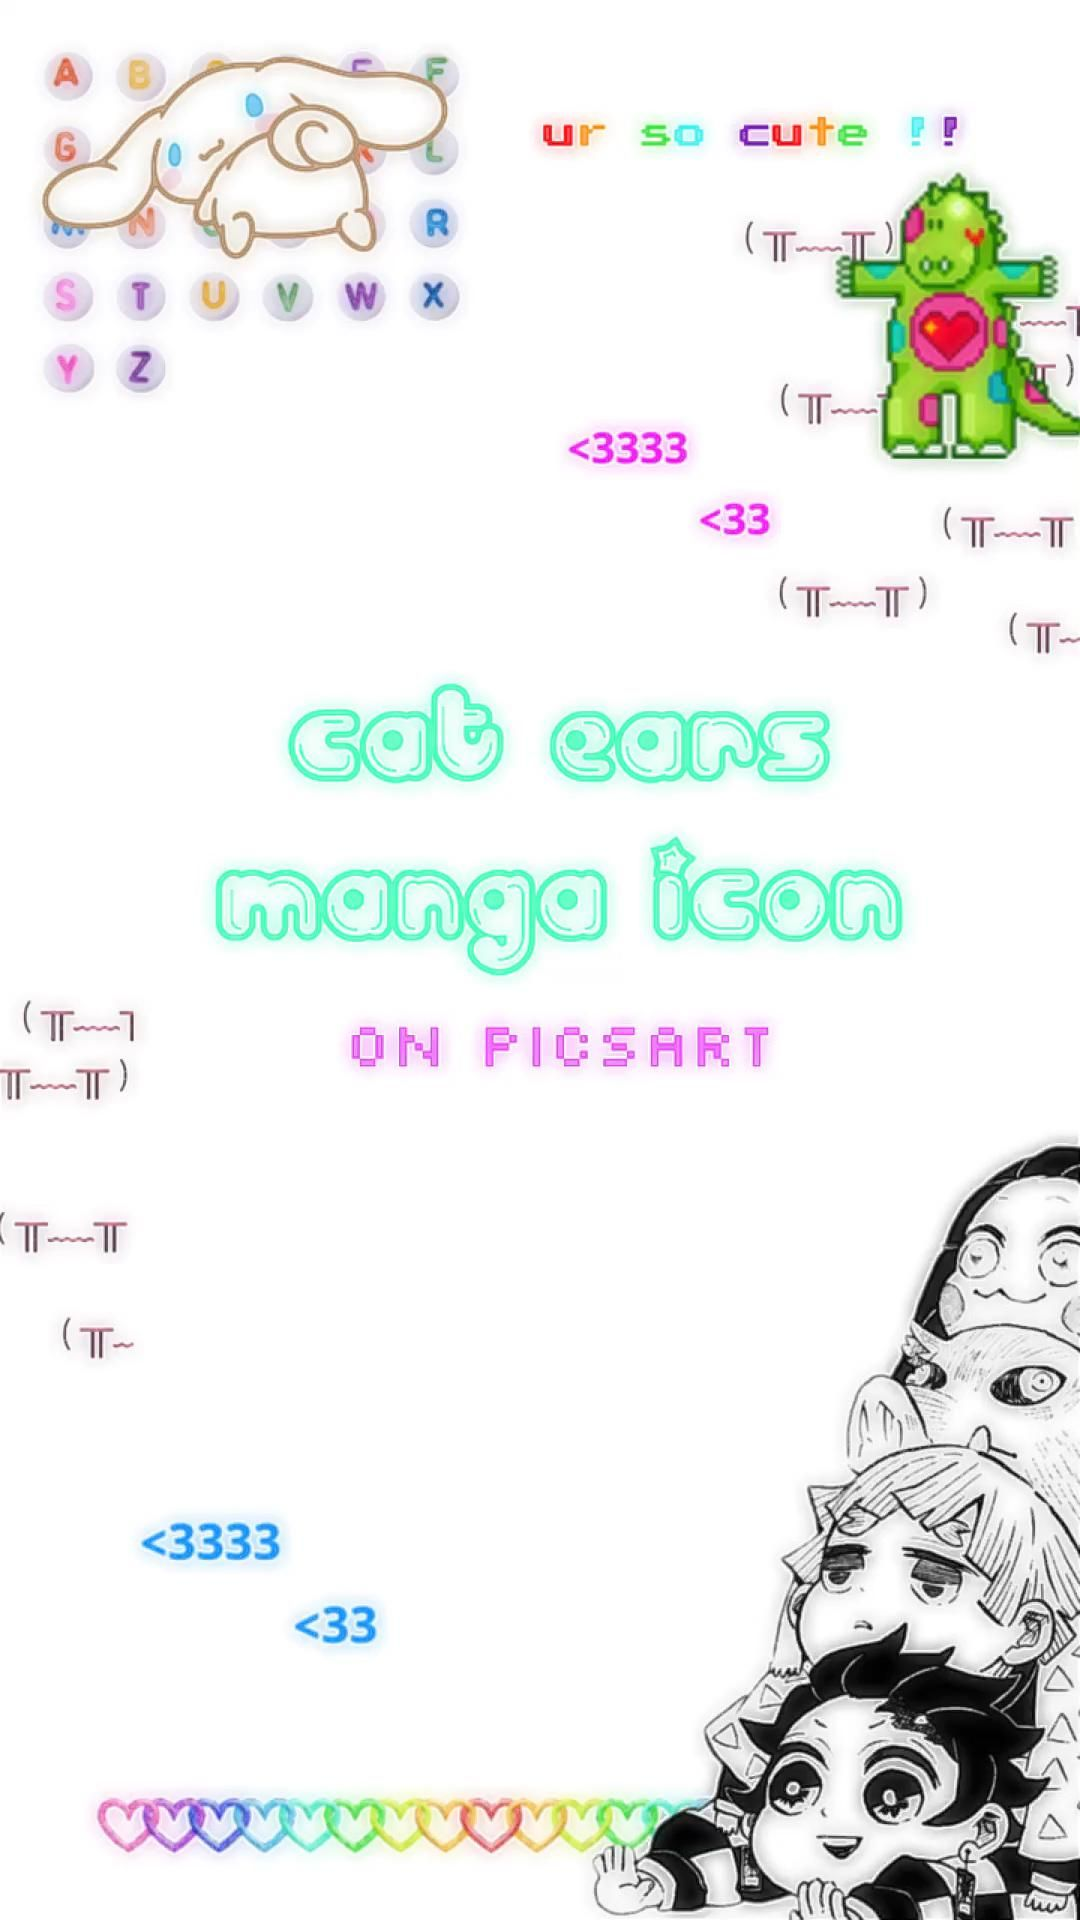 : how to make cat ears (catboy/catgirl) manga icons!¡